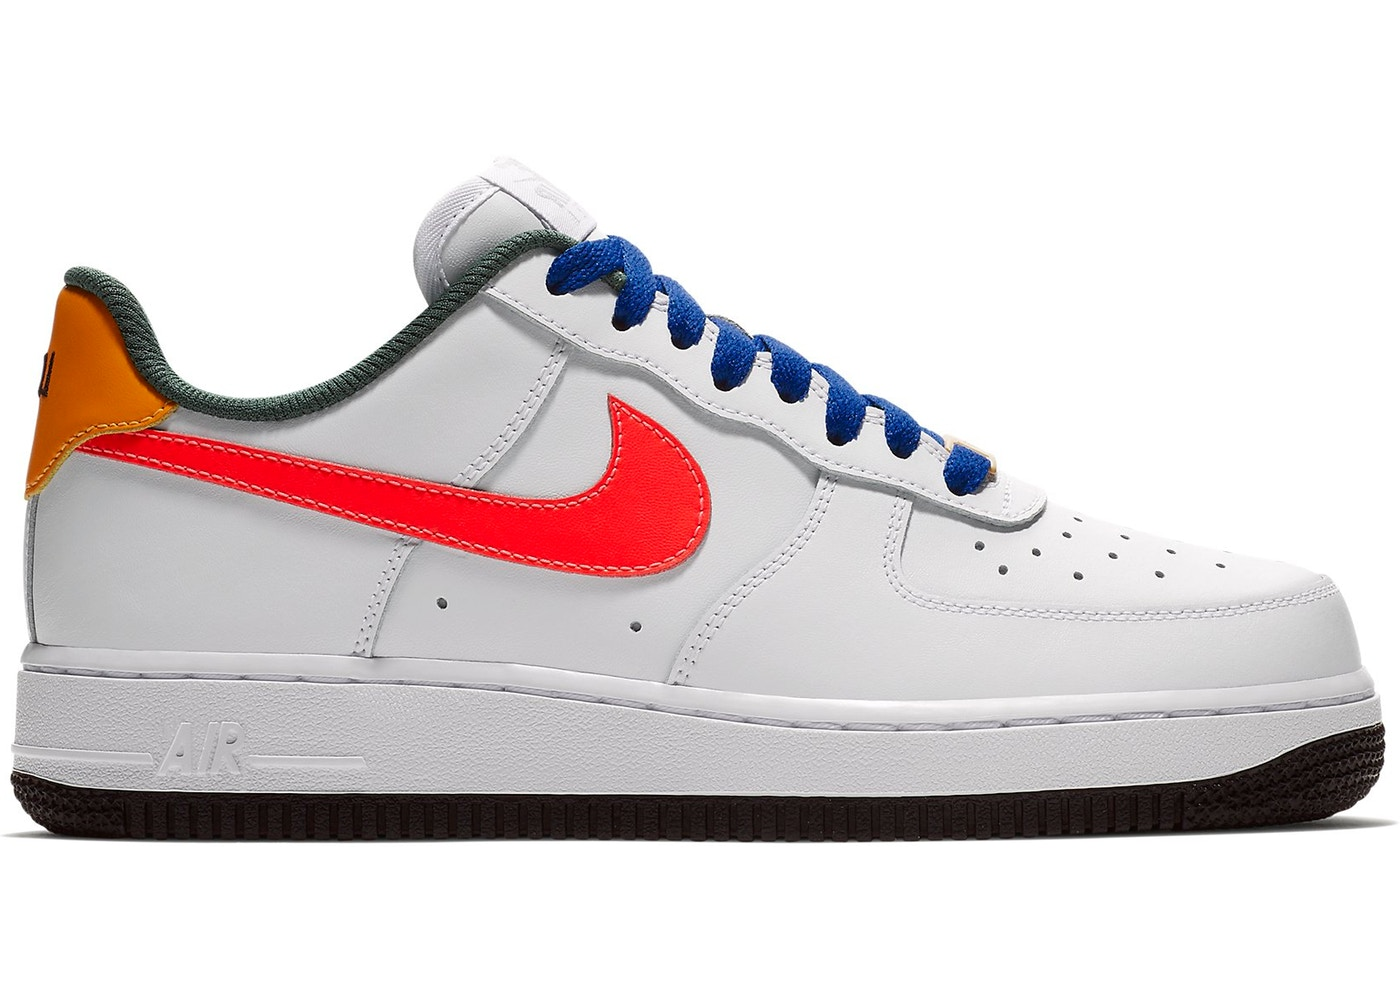 Nike Air Force 1 Low Love